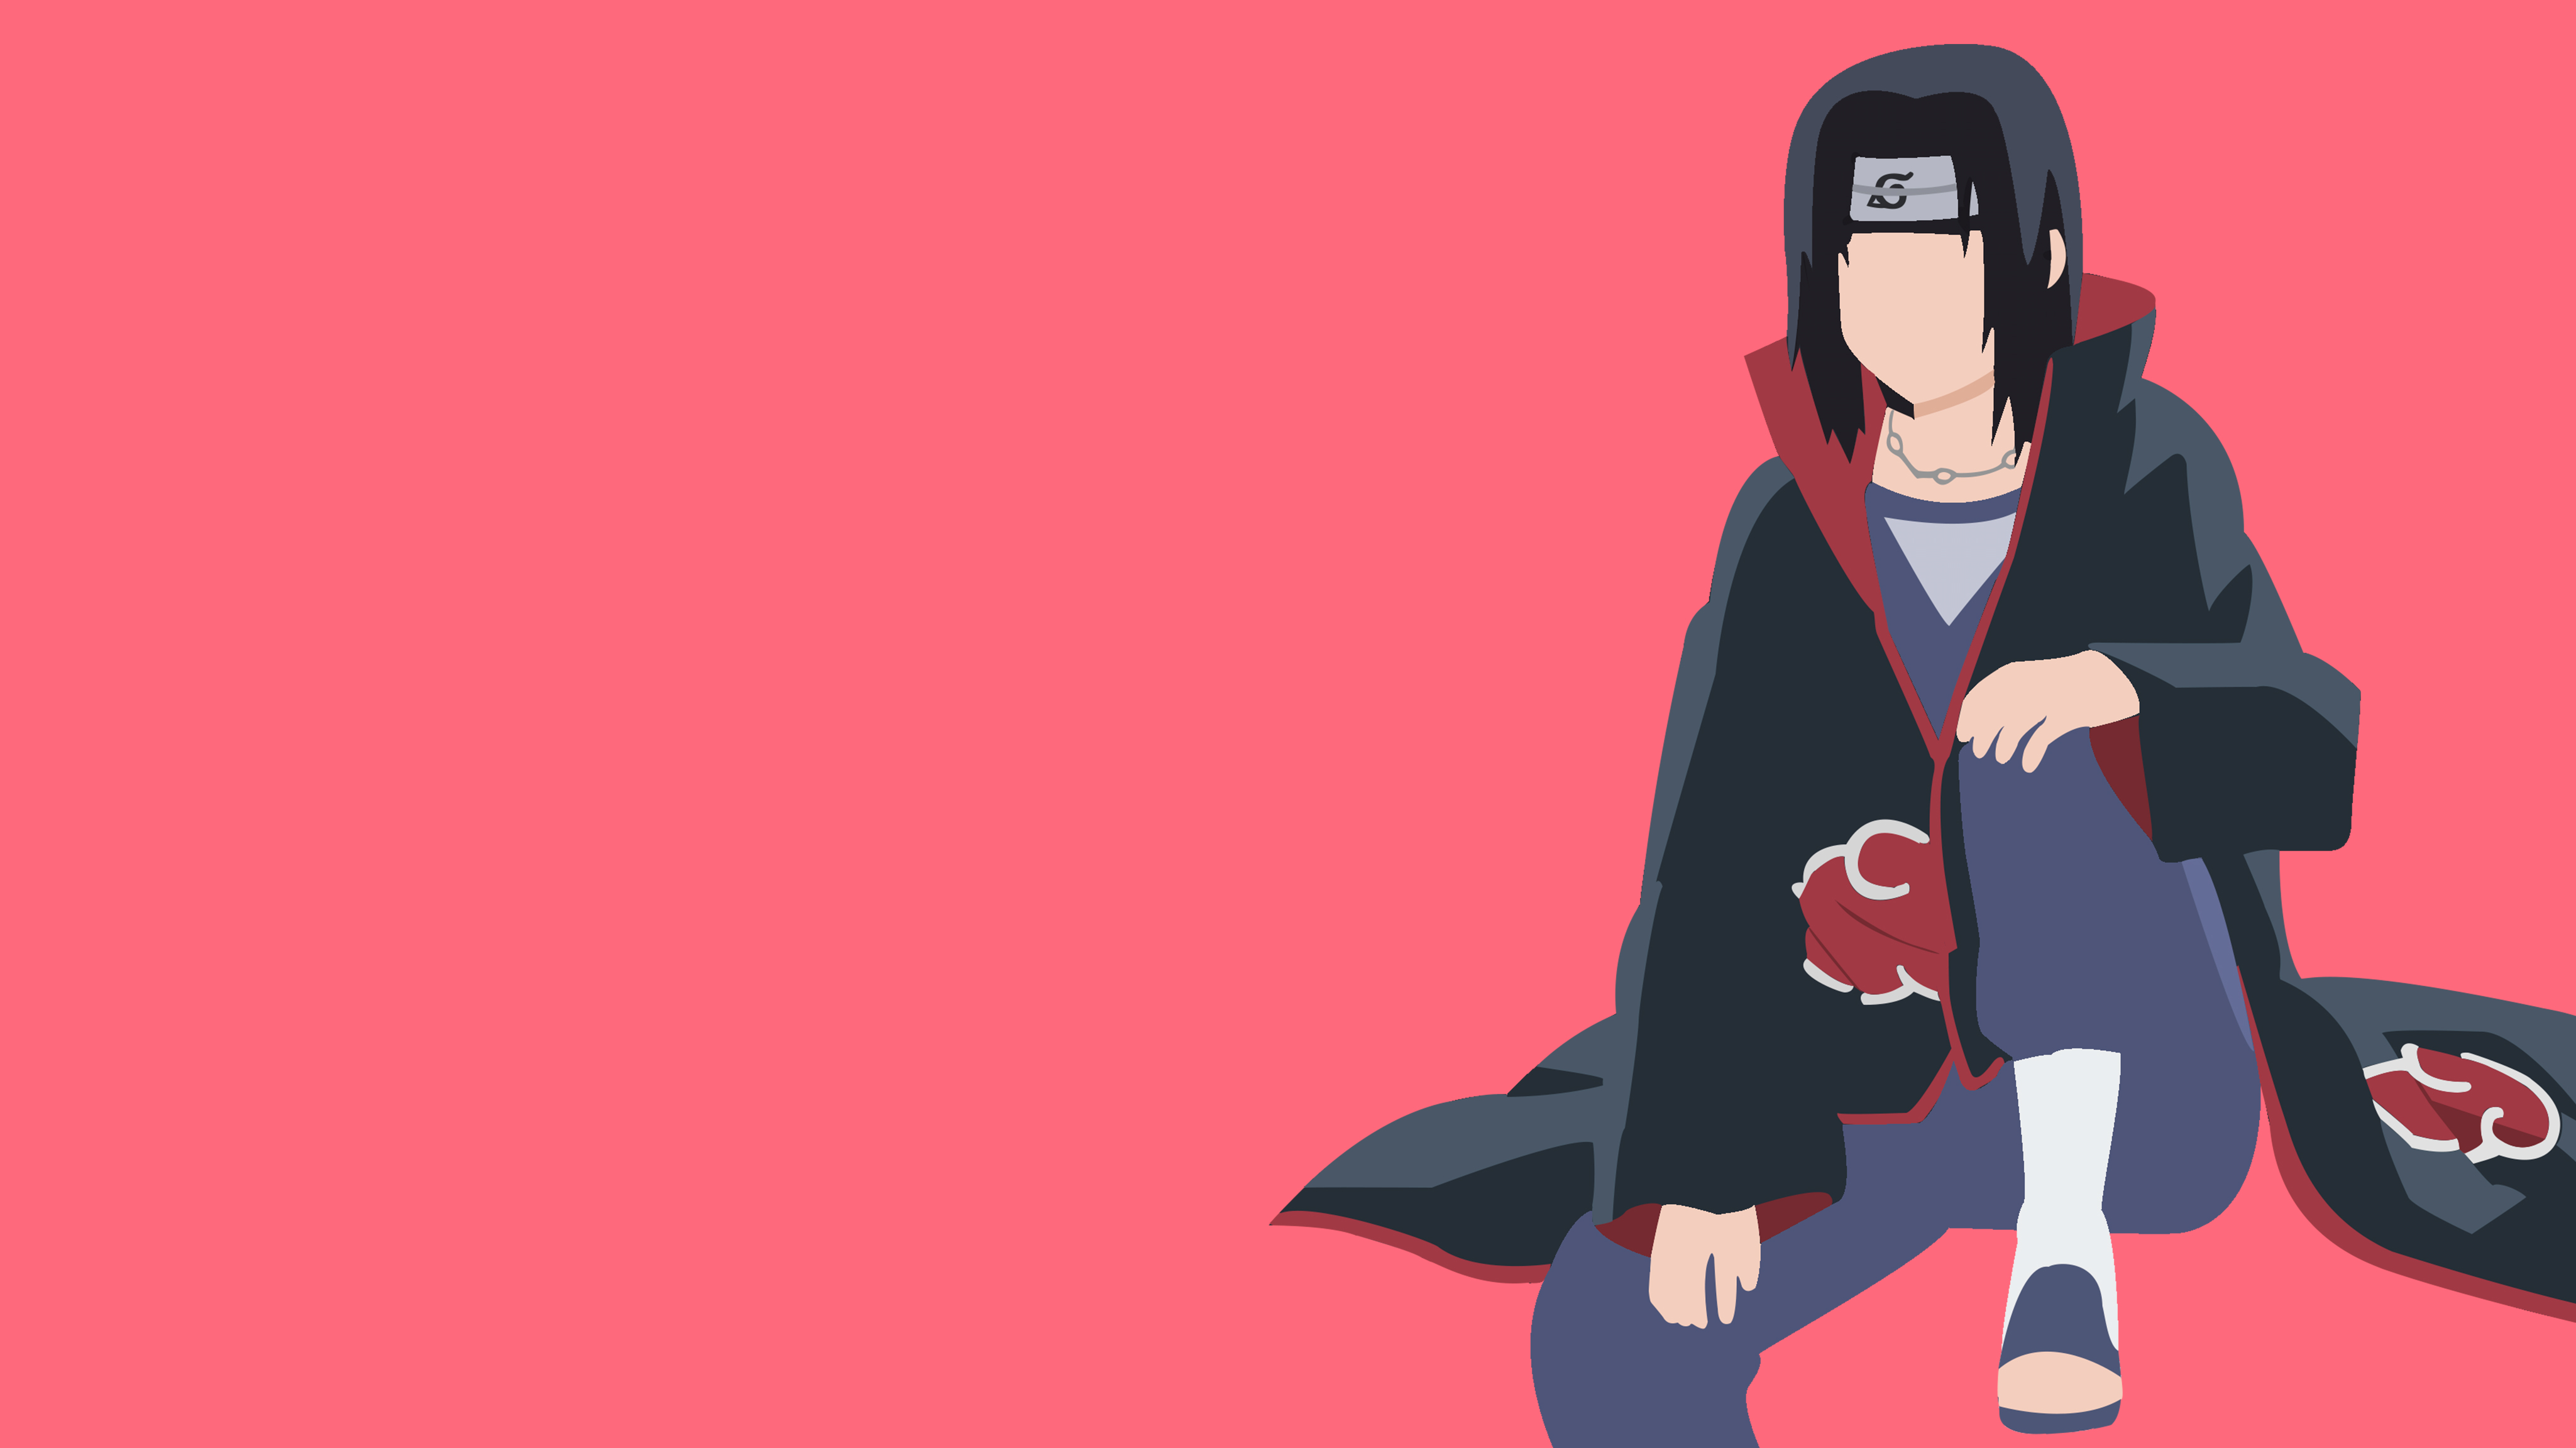 Akatsuki Naruto 4K Anime Wallpaper, HD Minimalist 4K ...